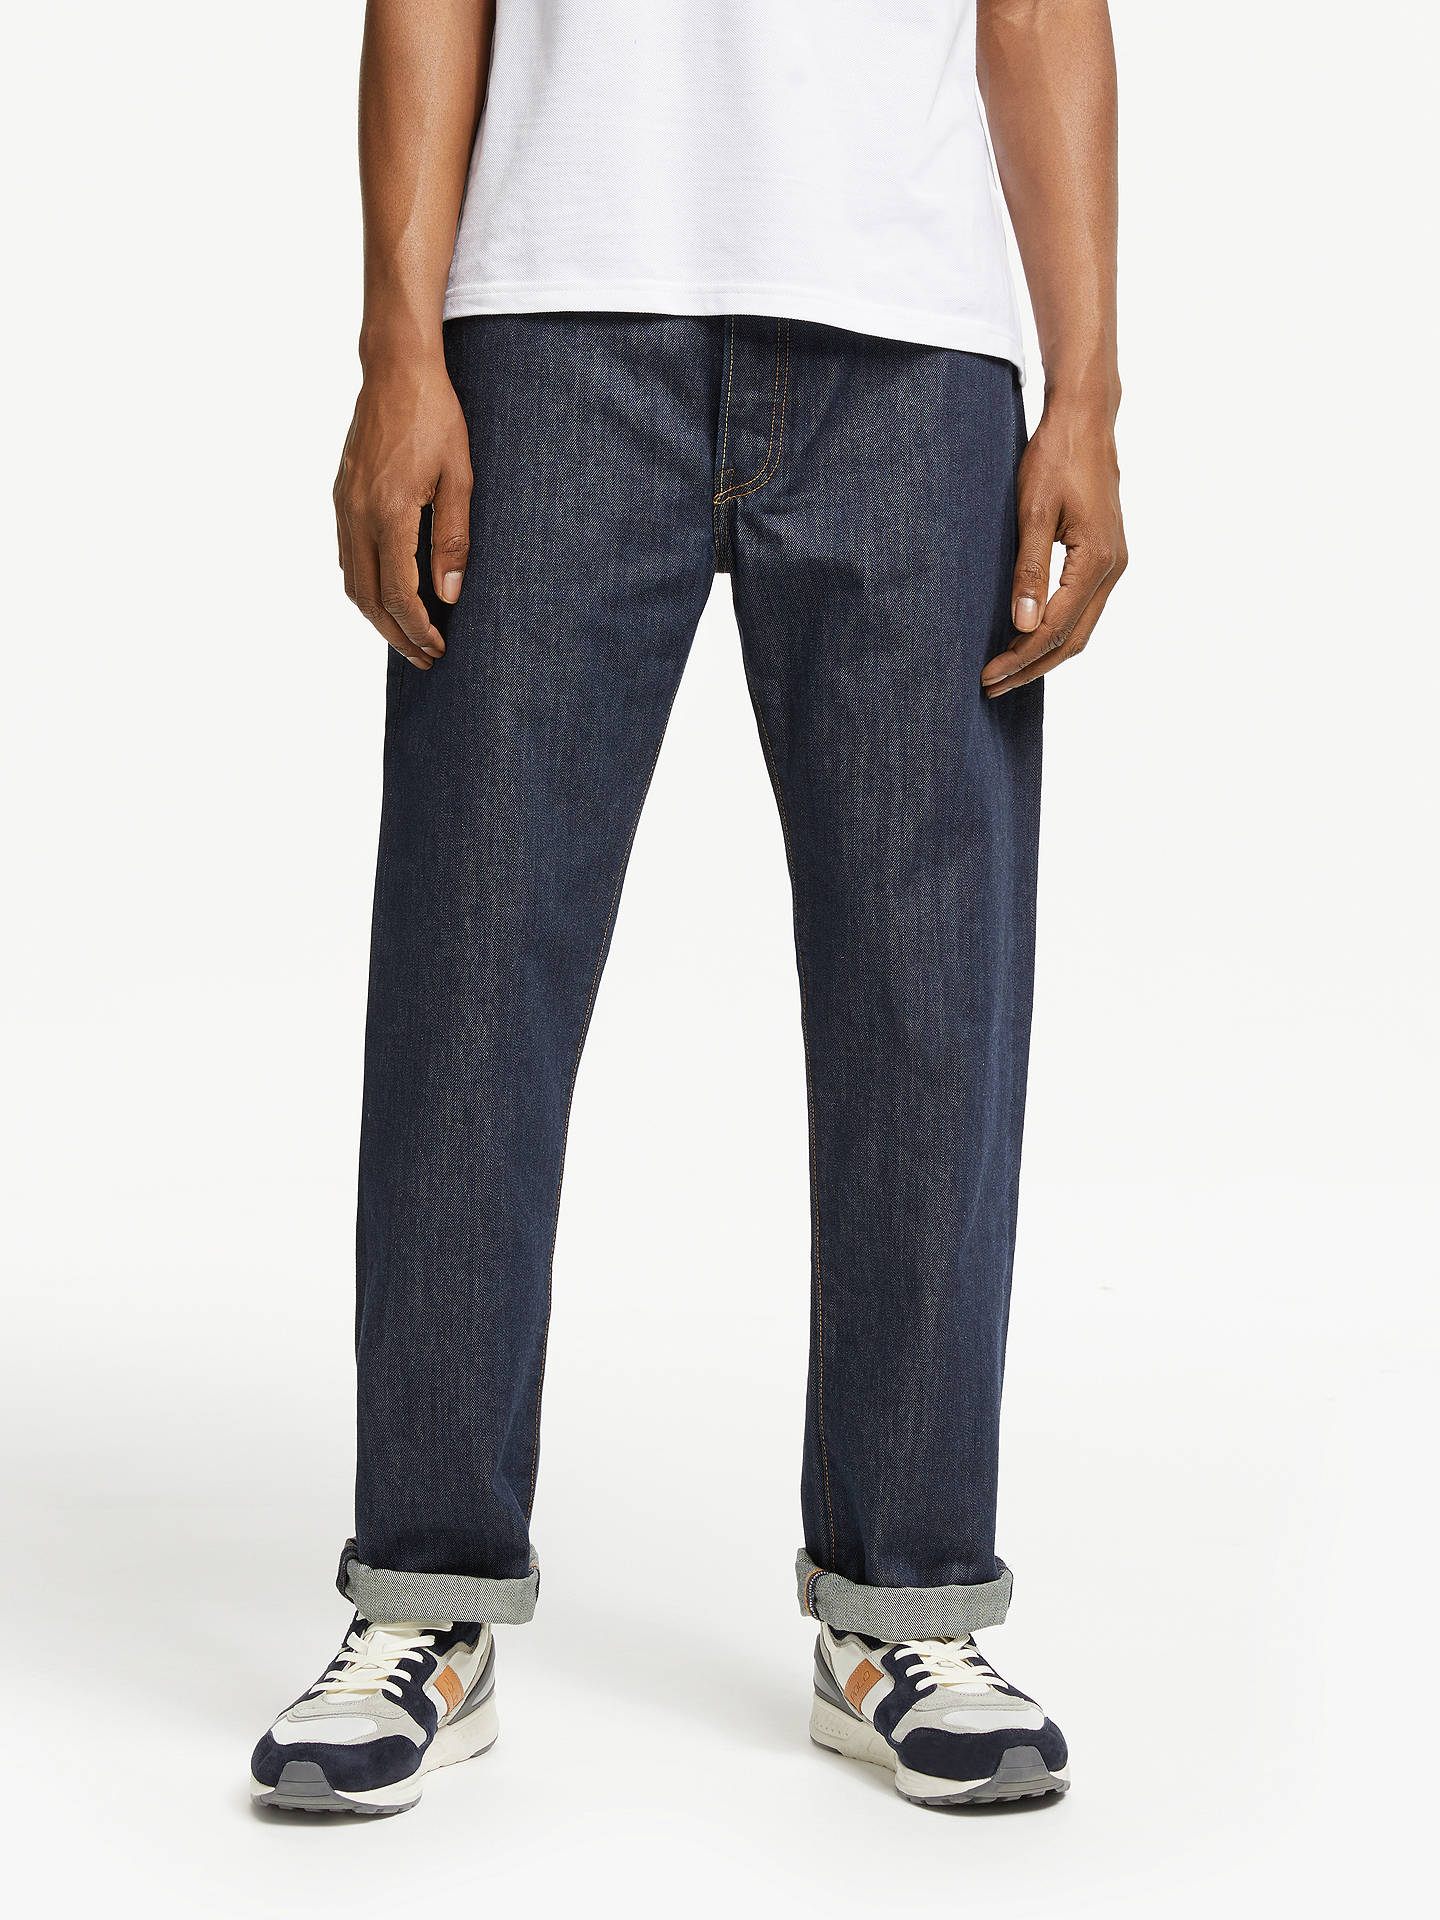 01e62b66b2b ... Buy Levi s 501 Original Straight Jeans